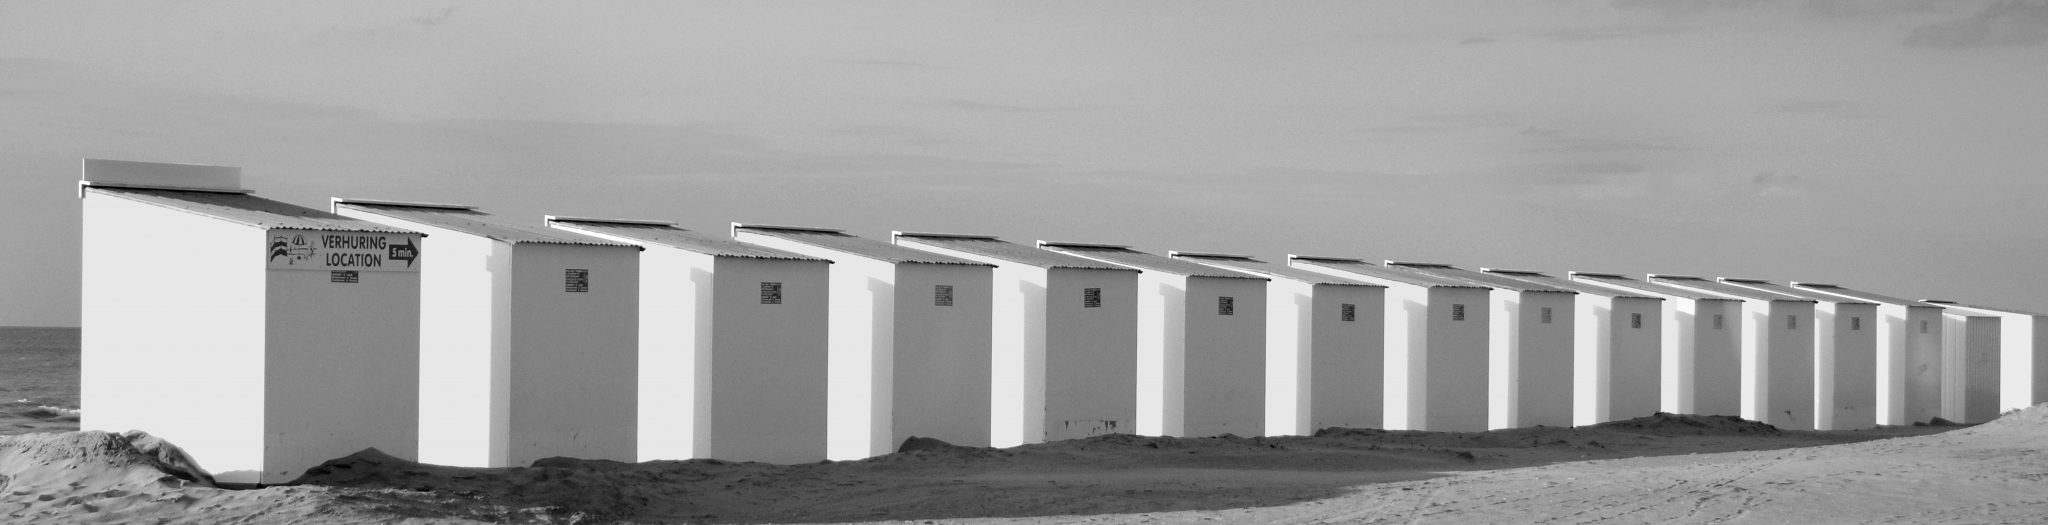 strandhuisjes_beach-cabins_kust_fred-de-krom-fotografie-en-beeldbewerking_2